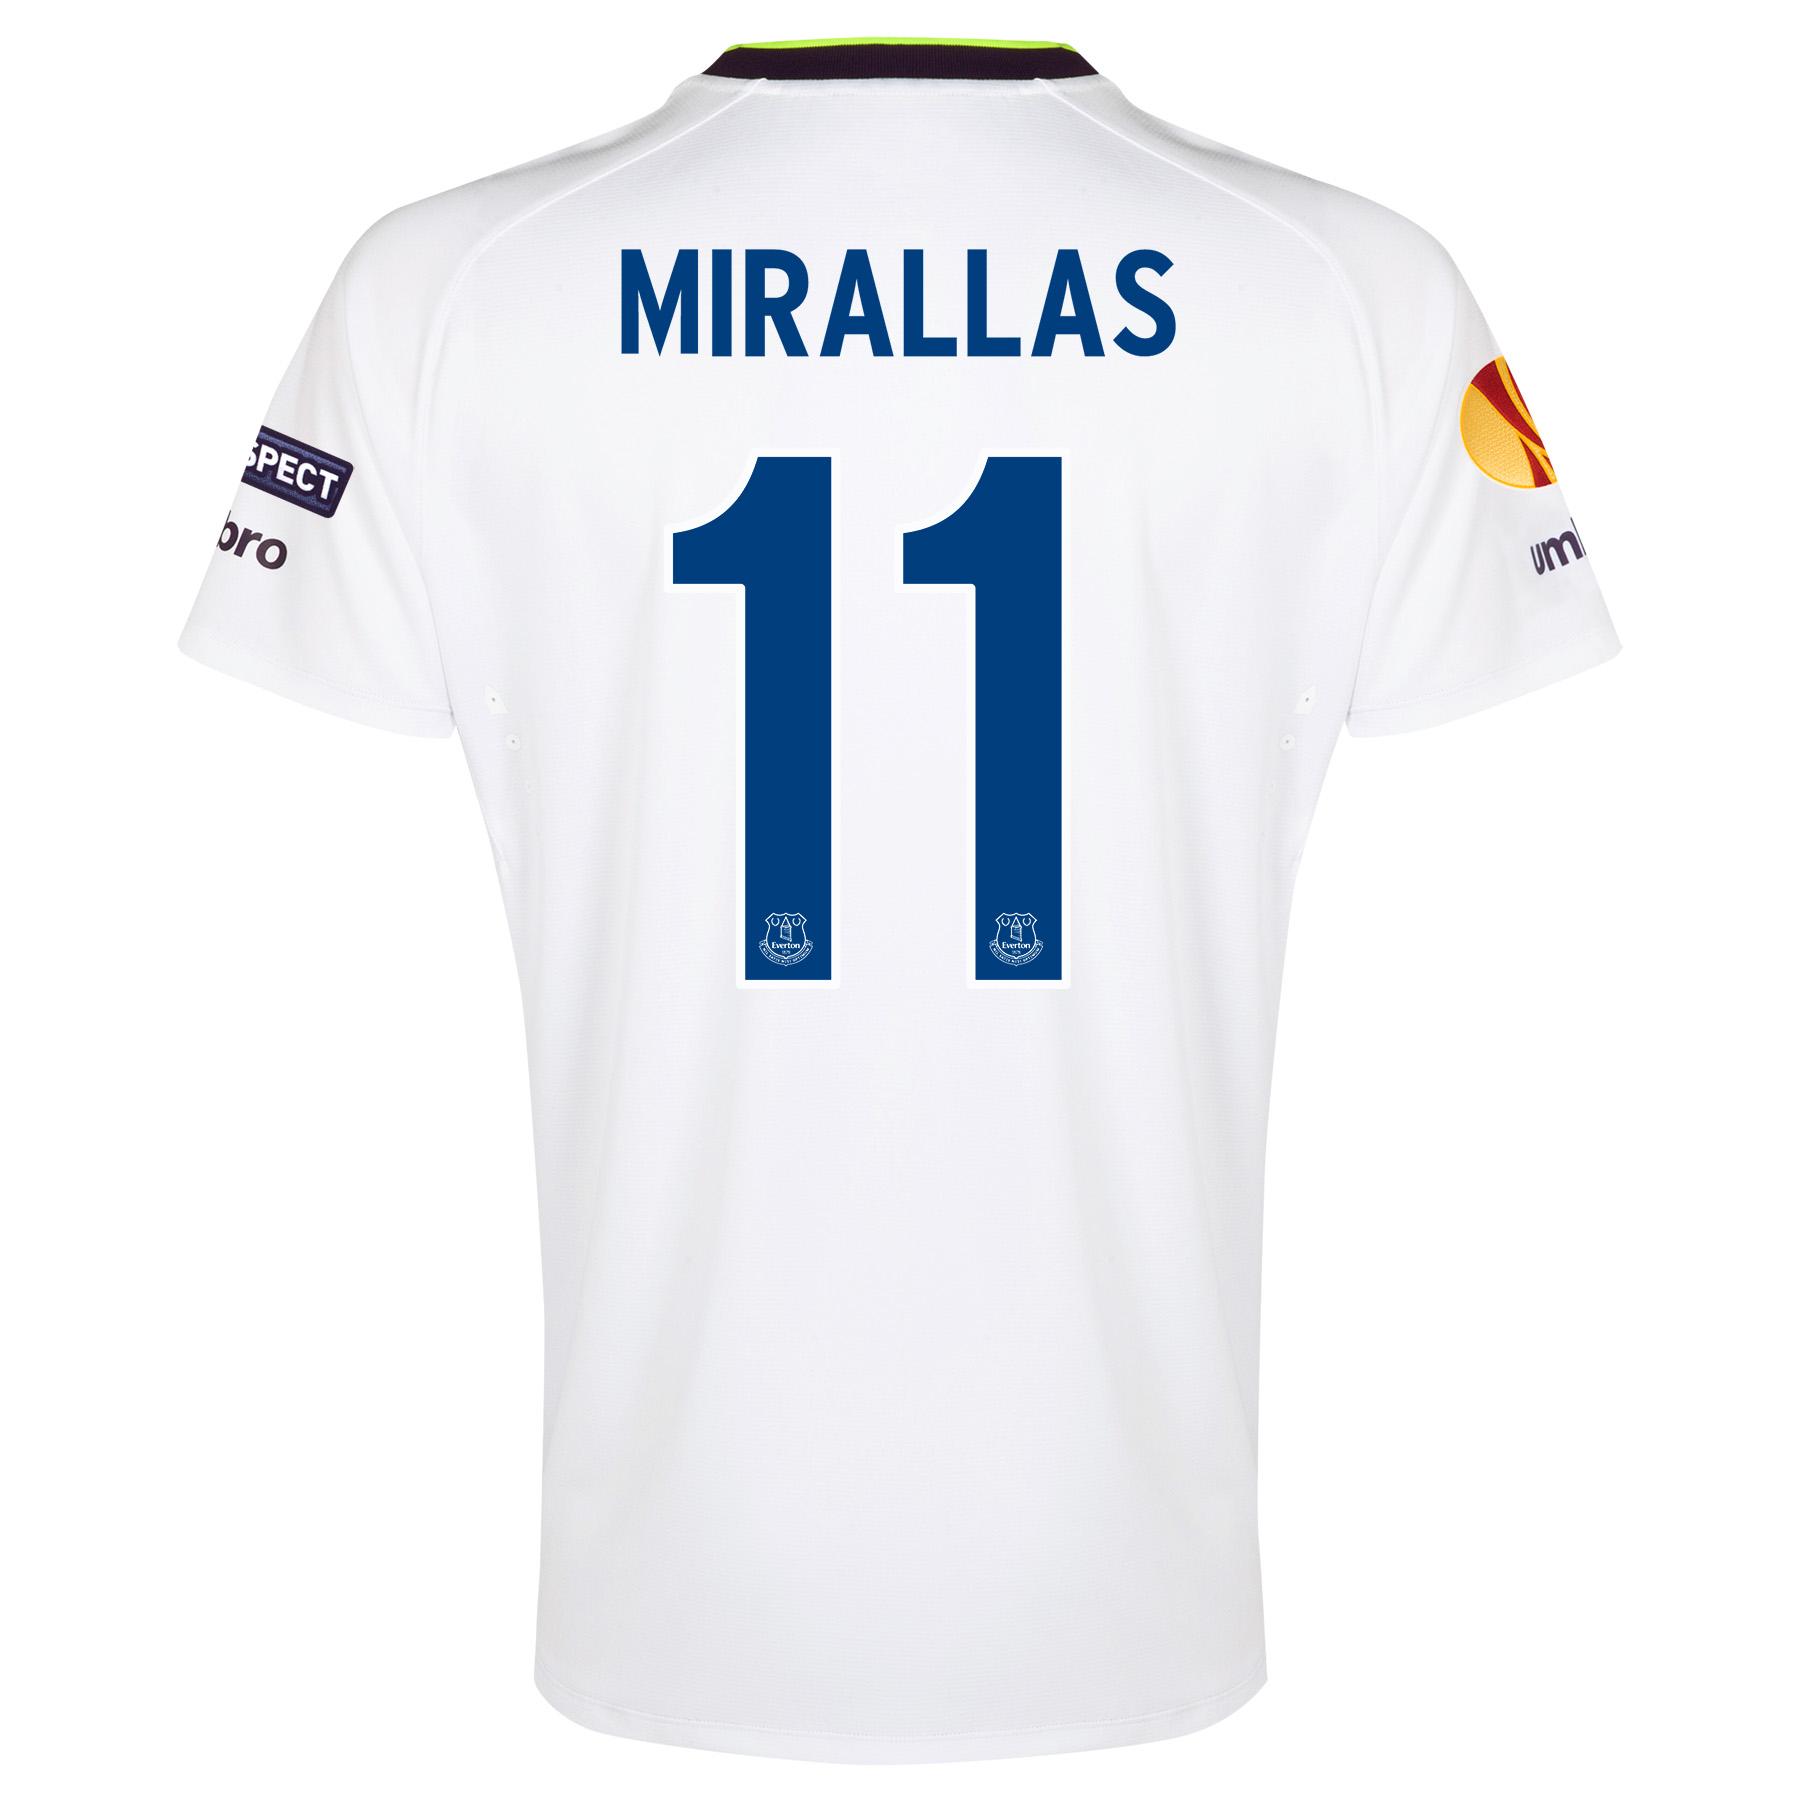 Everton UEFA Europa League 3rd Shirt 2014/15 - Junior with Mirallas 11 printing